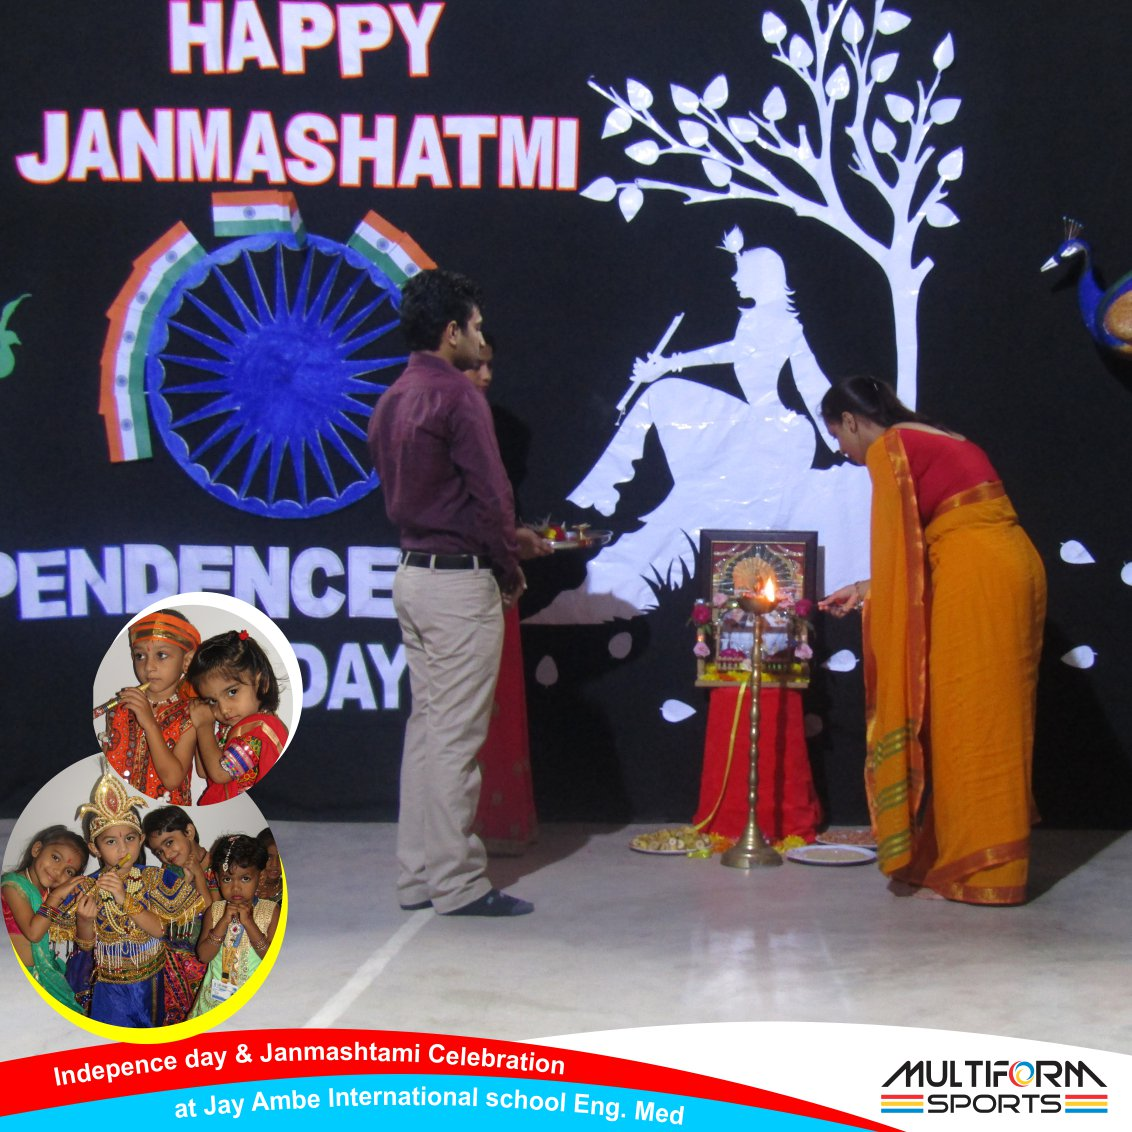 #Indepence day &amp; #Janmashtami Celebration done at #JayAmbeInternationalschool Eng. Med under event management of #Multiform Sports<br>http://pic.twitter.com/wQyjPusuEQ